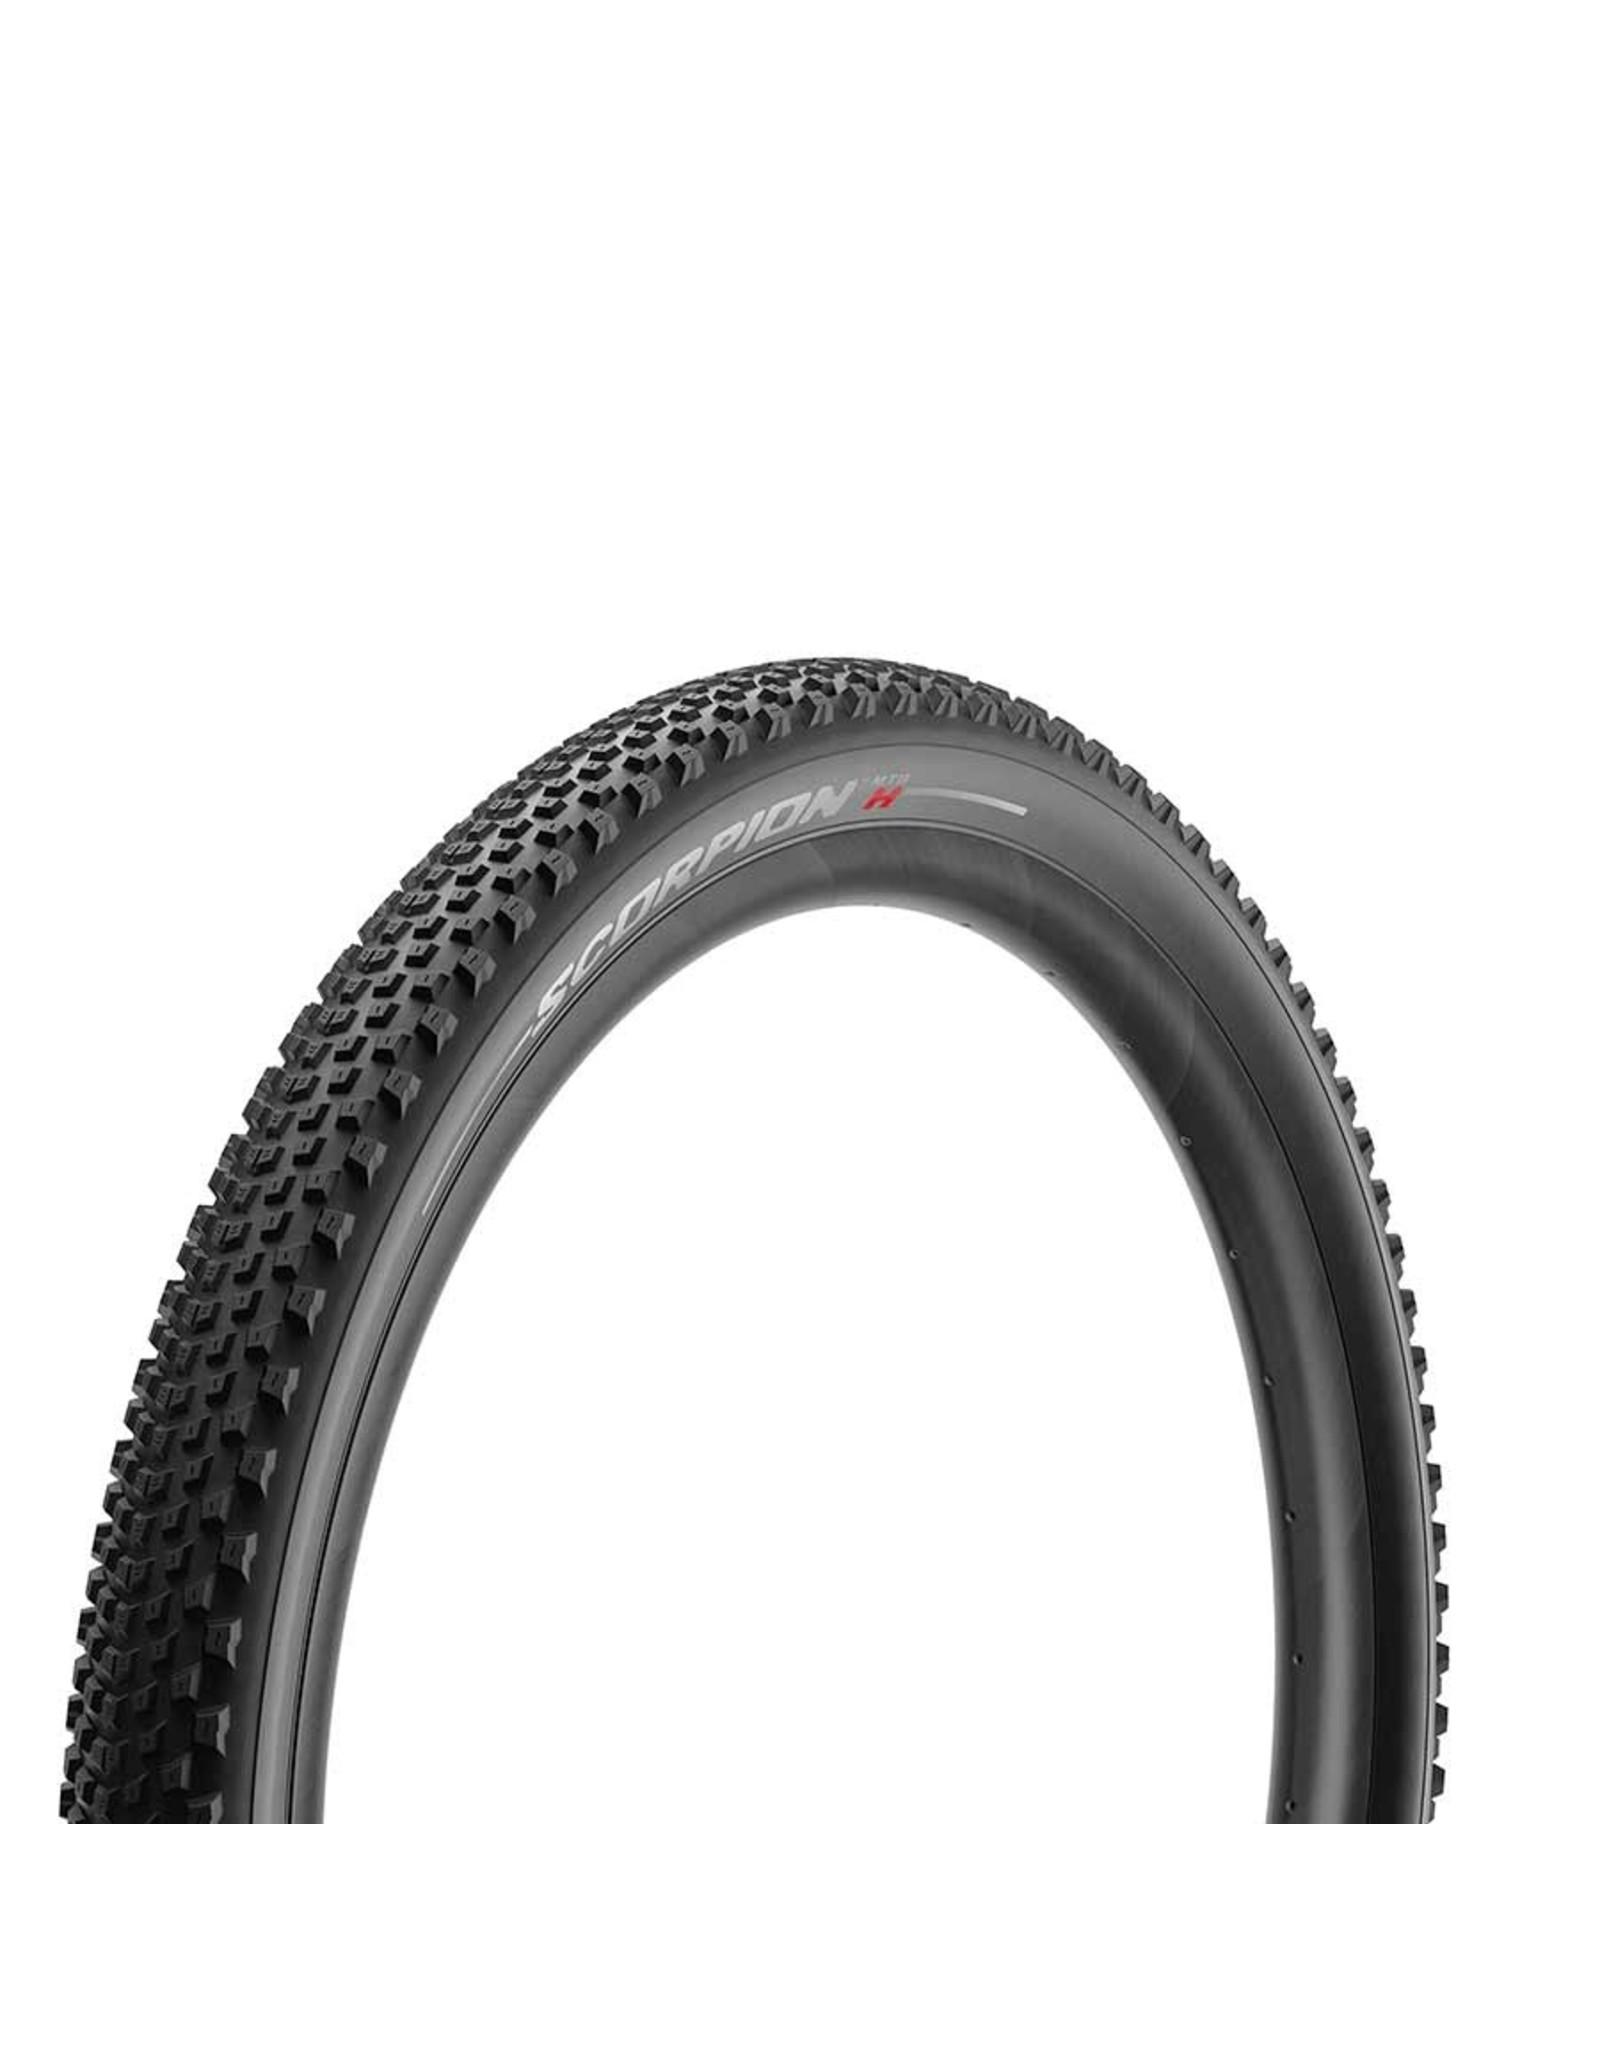 Pirelli Pirelli, Scorpion MTB H, Tire, 29''x2.20, Folding, Tubeless Ready, Smartgrip, 120TPI, Black